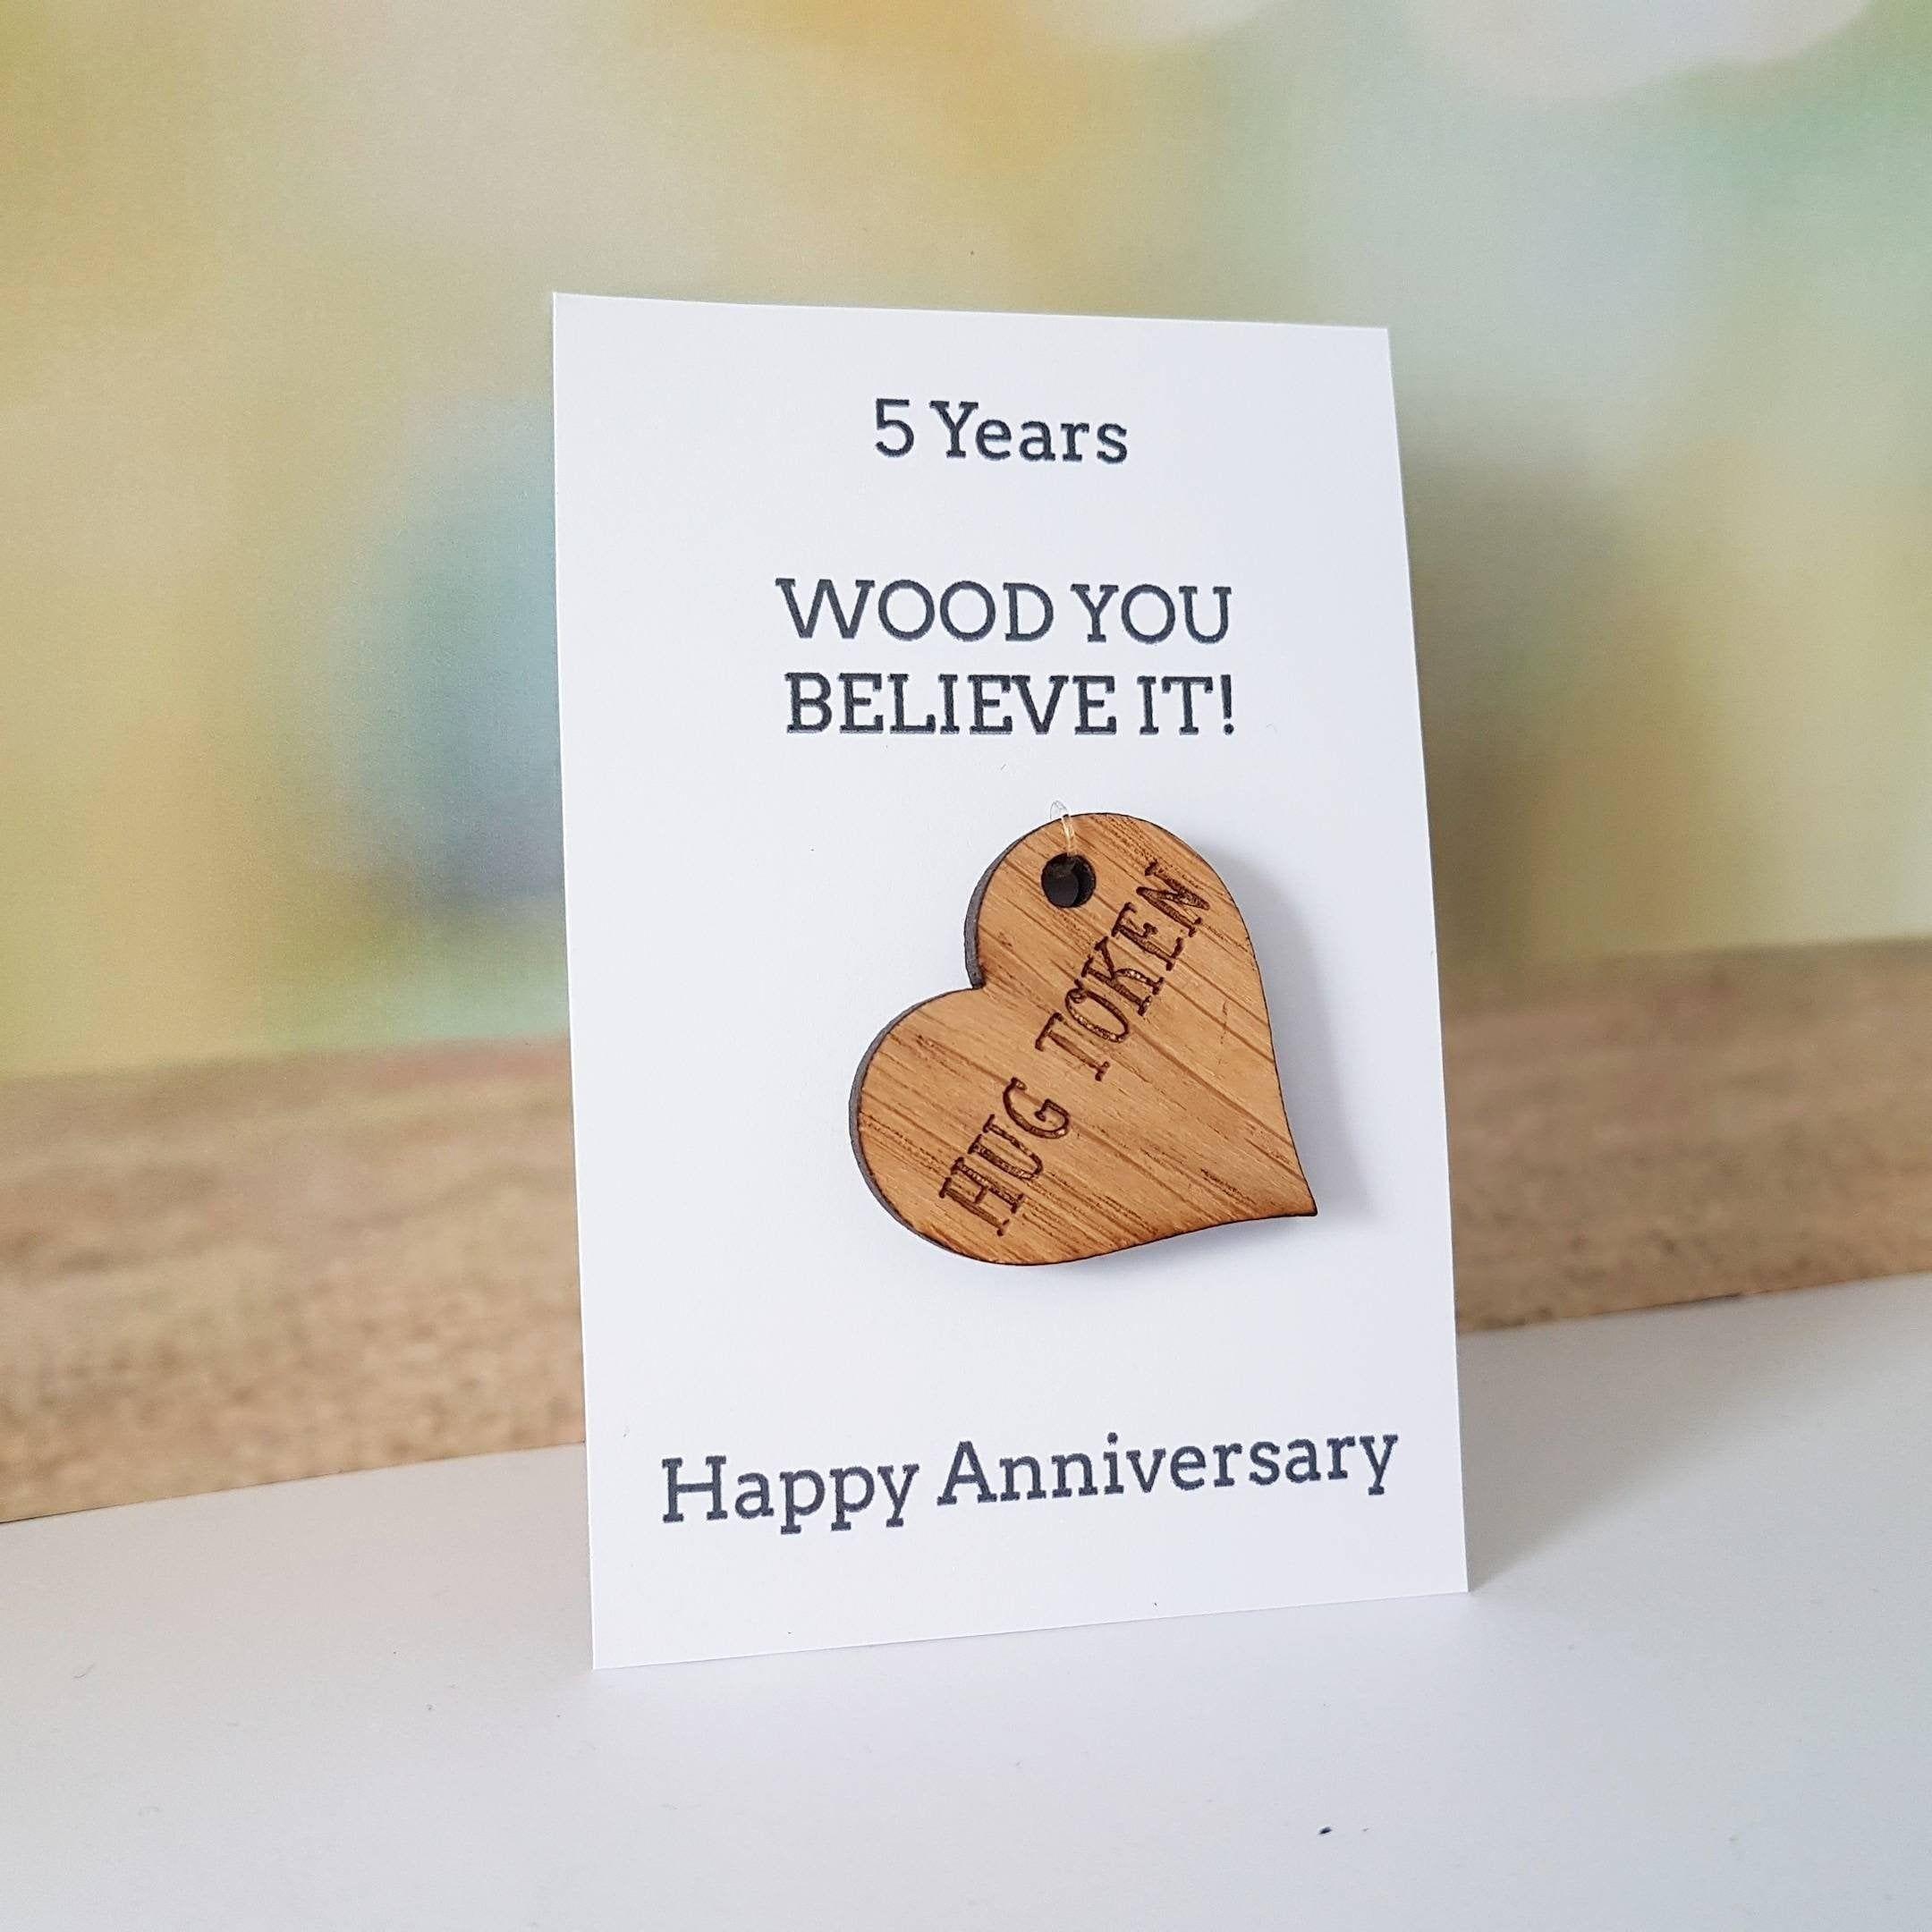 5th Anniversary Card Husbandgift Wife Card Wood Wooden Gift Wedding Anniversary Gift For H Gifts For Husband Wedding Anniversary Wishes Anniversary Cards